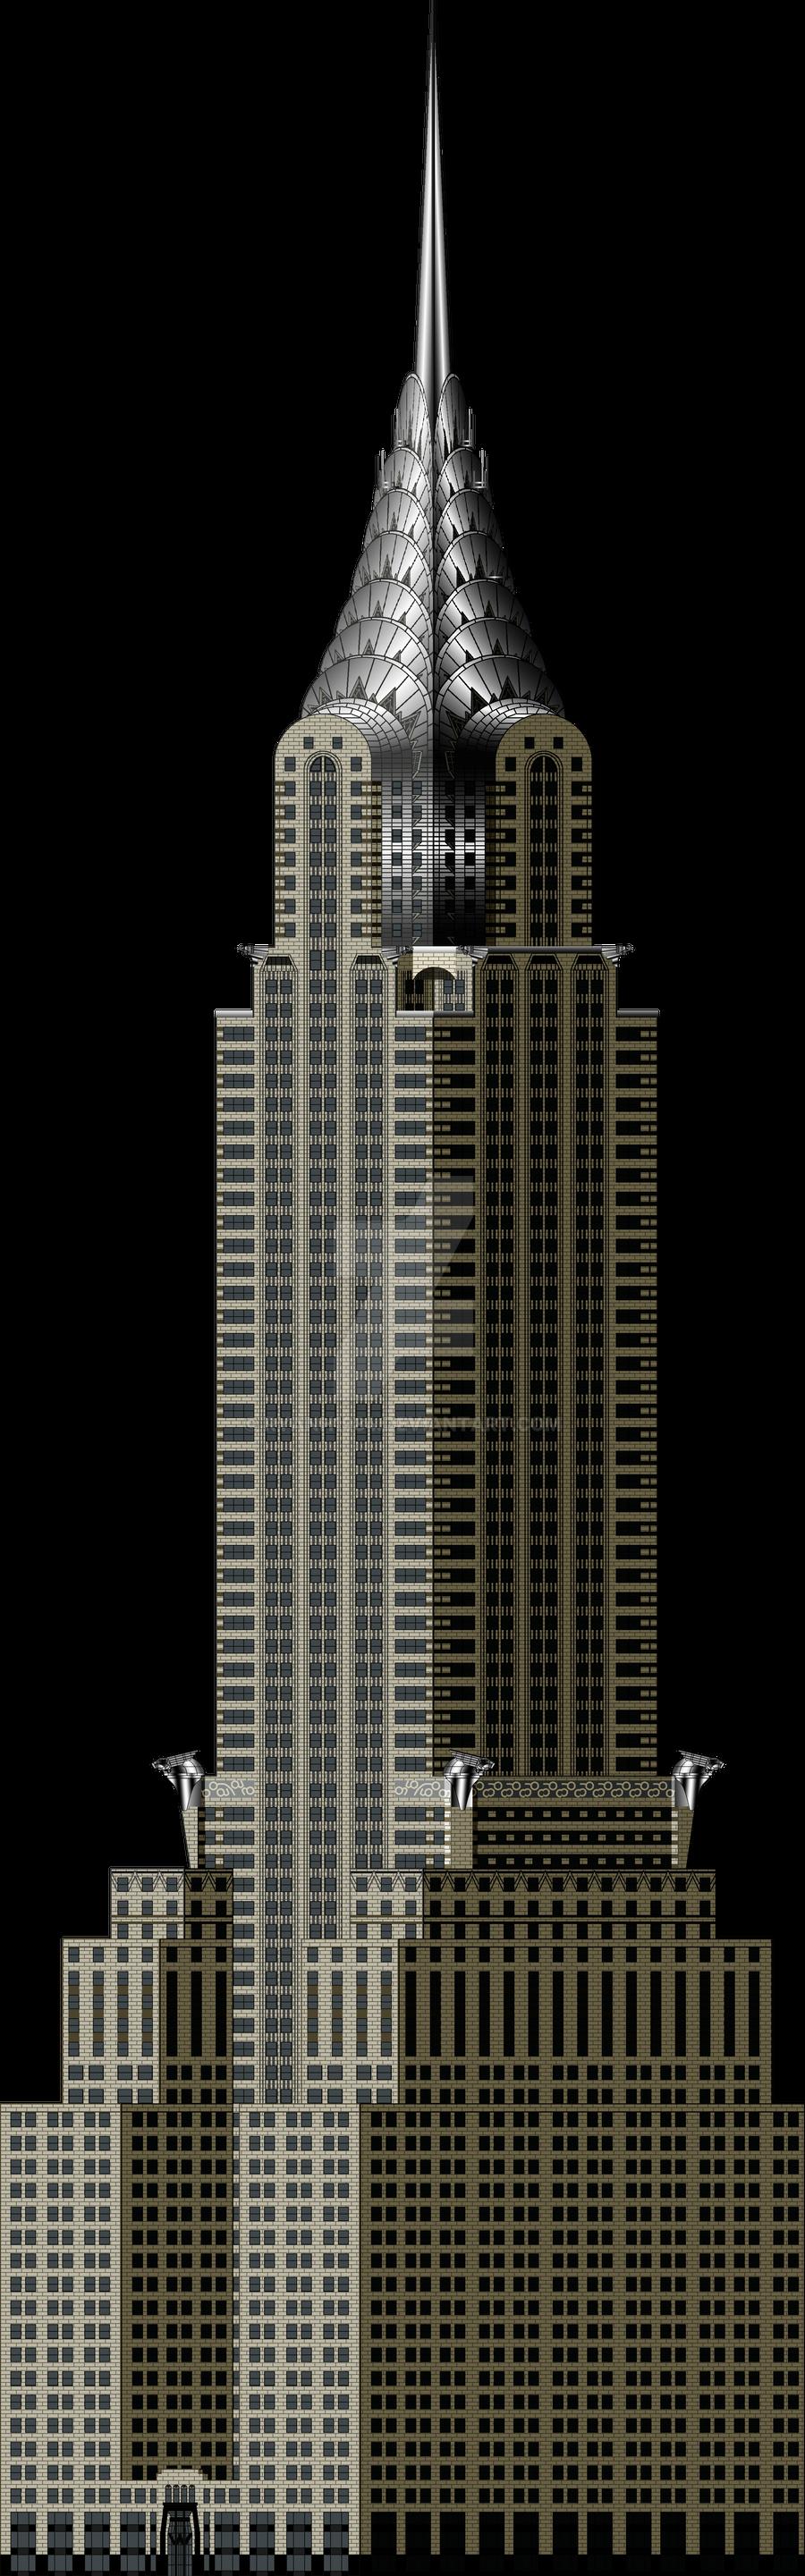 New Chrysler Building 2013 by RyanH1984 on DeviantArt